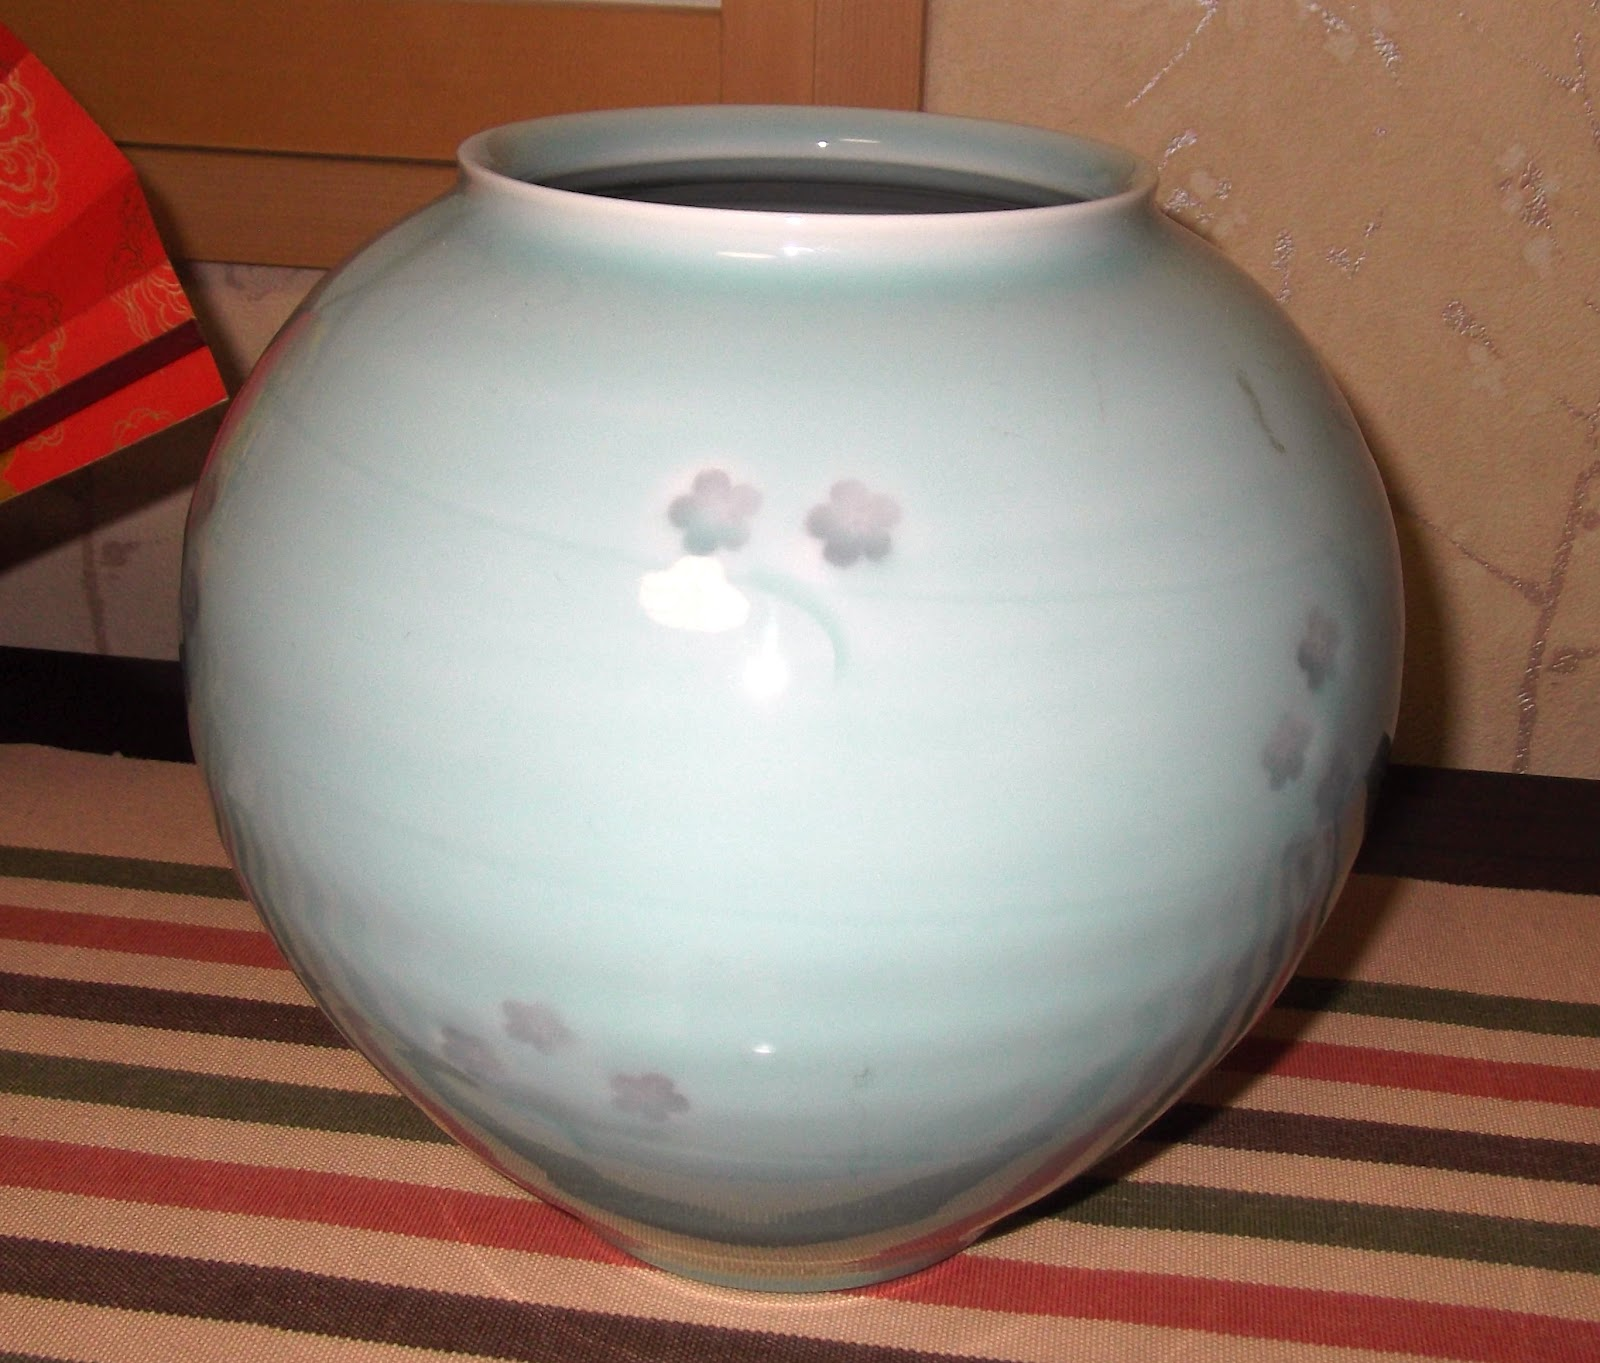 Modern japanese pottery and porcelain marks february 2012 modern japanese pottery and porcelain marks reviewsmspy